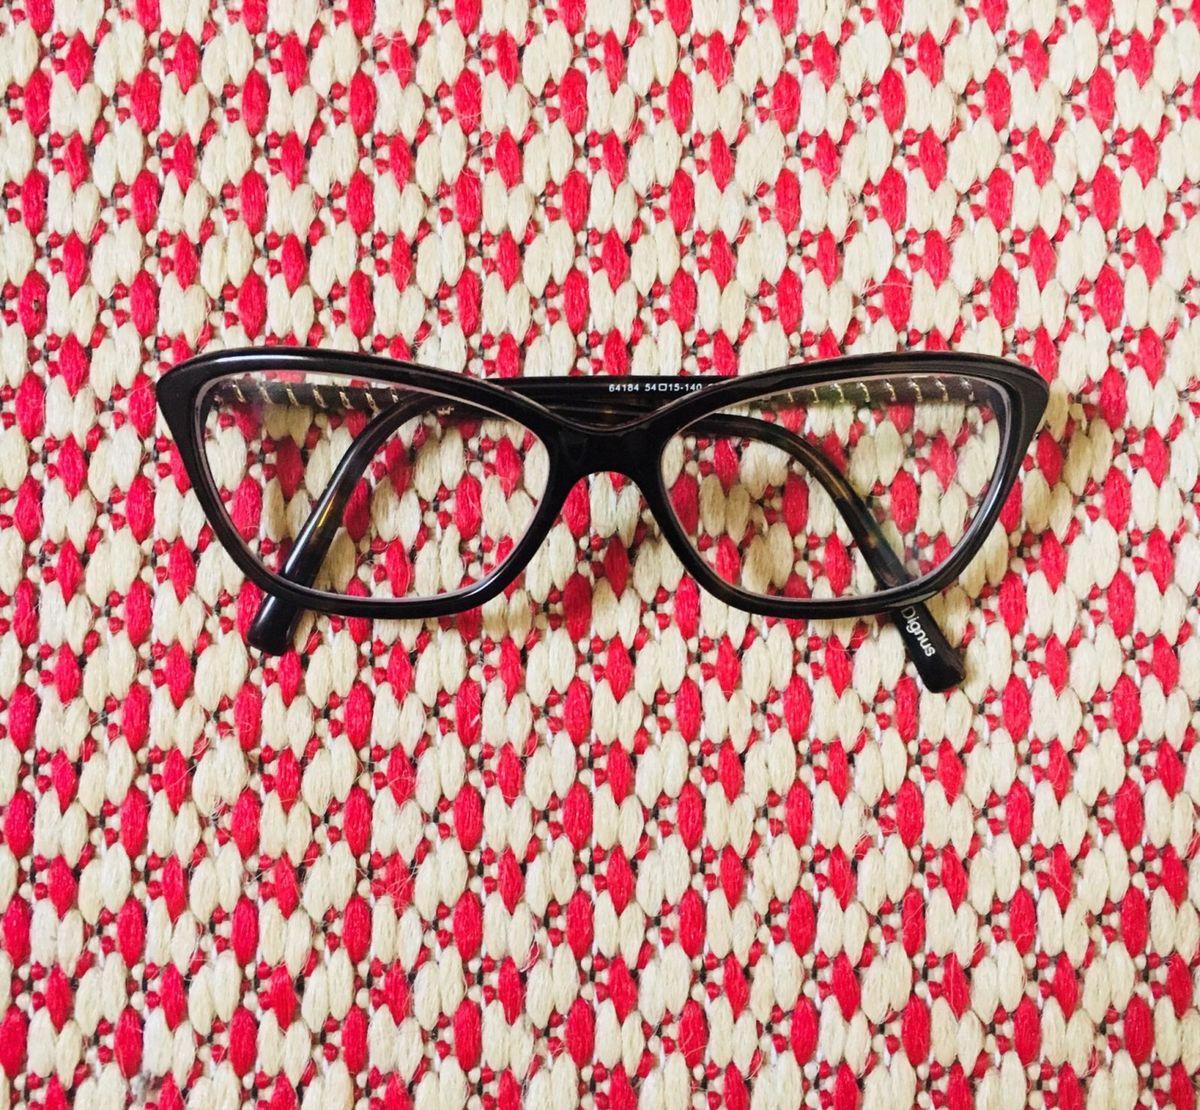 armação gatinho dignus - óculos dignus.  Czm6ly9wag90b3muzw5qb2vplmnvbs5ici9wcm9kdwn0cy8xmdmwntq2lzm1ymi0nwfiyti1mmq3ztayn2u5zmy2nda5owyxngy0lmpwzw  ... 1ad7595a3a